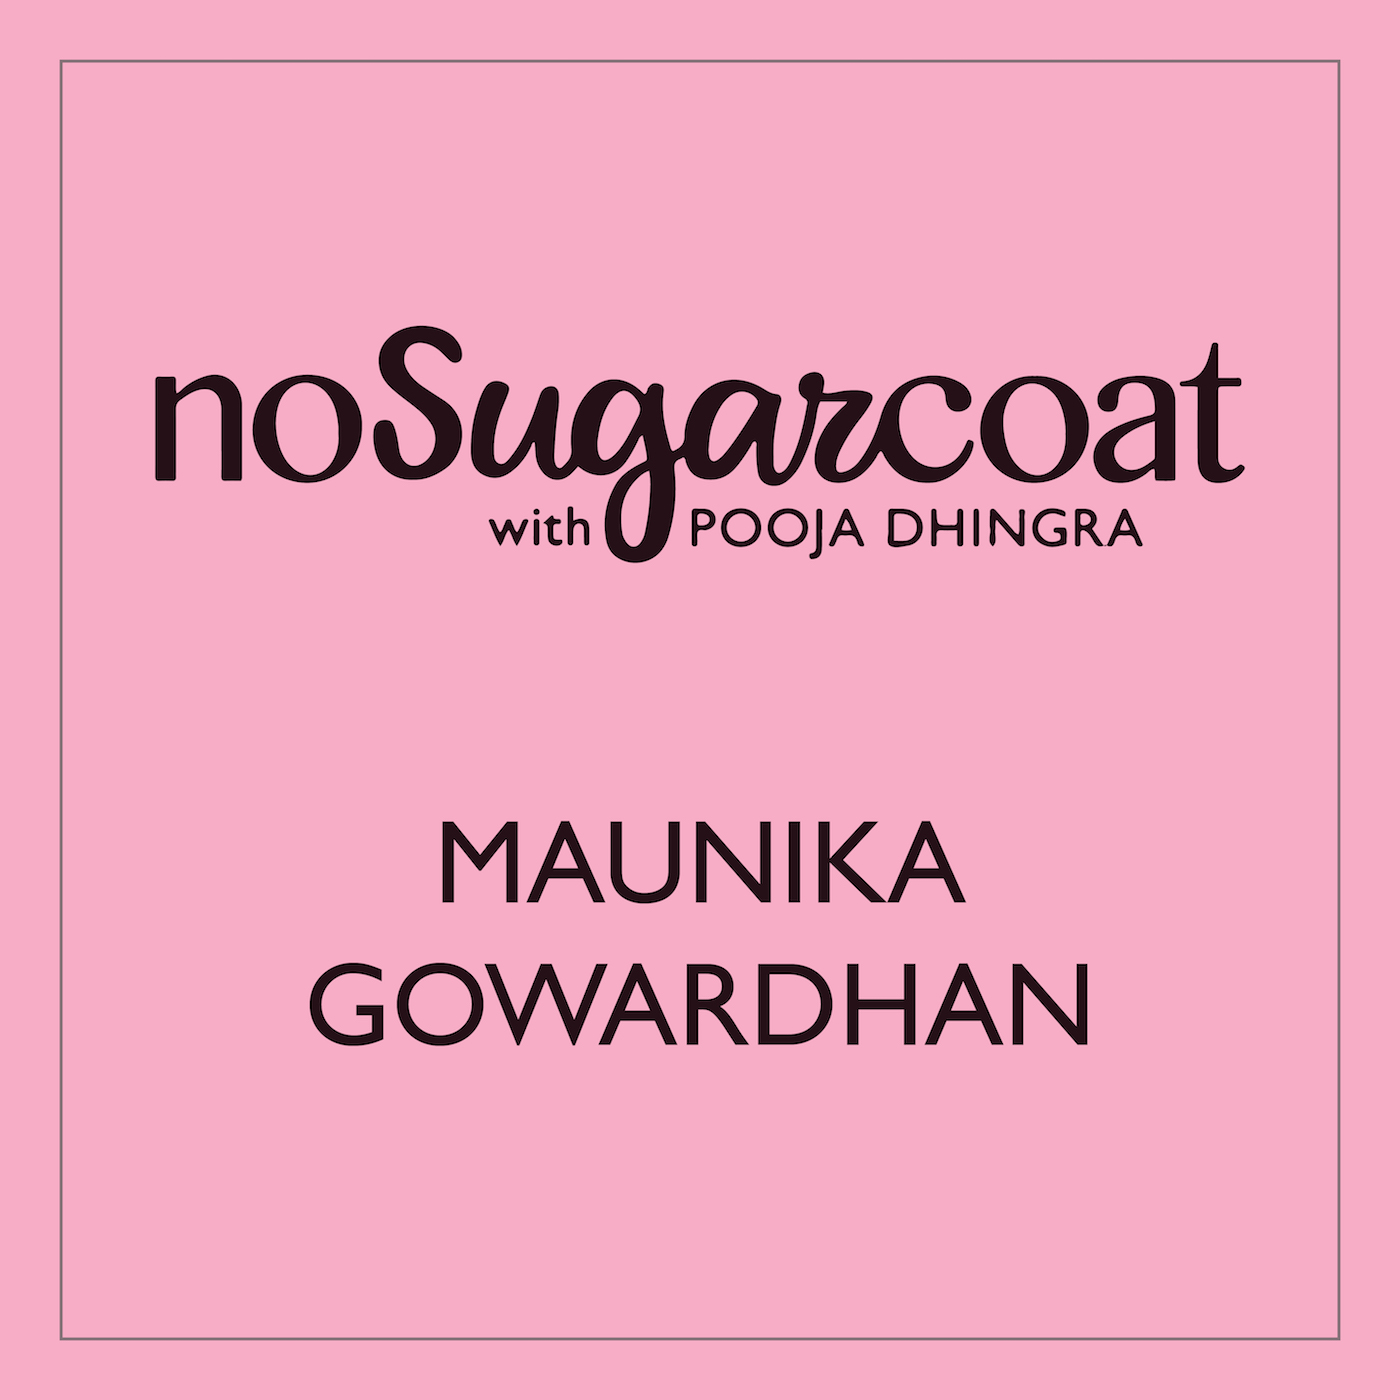 Maunika Gowardhan